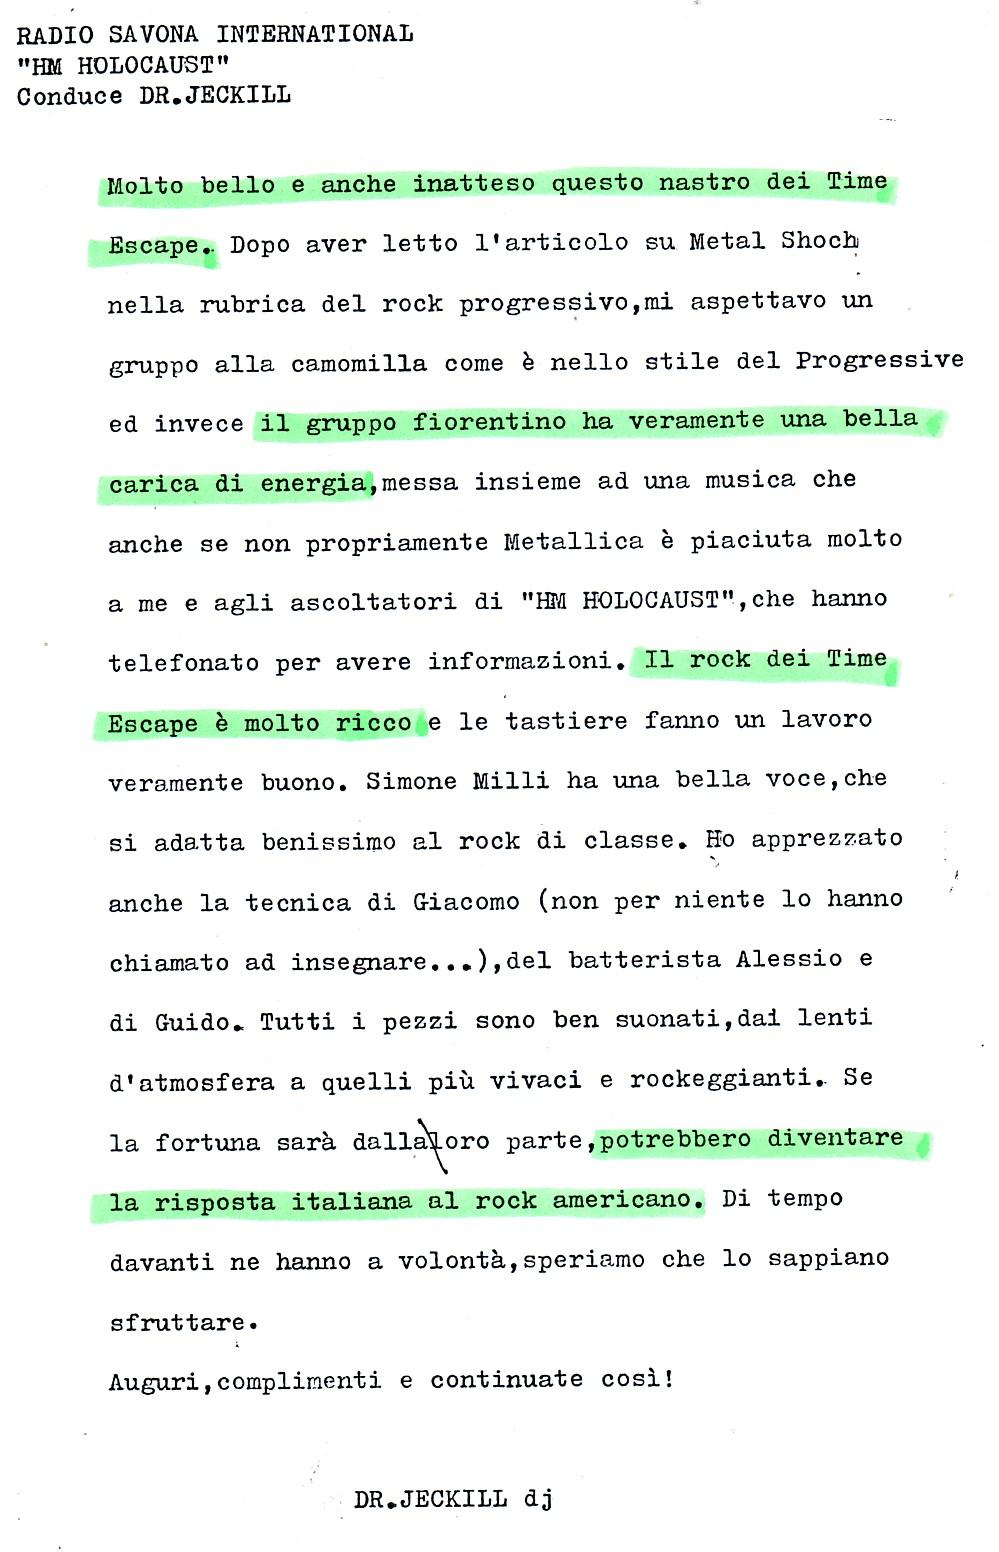 RADIO SAVONA INTERNATIONAL (ITALY) - 1988